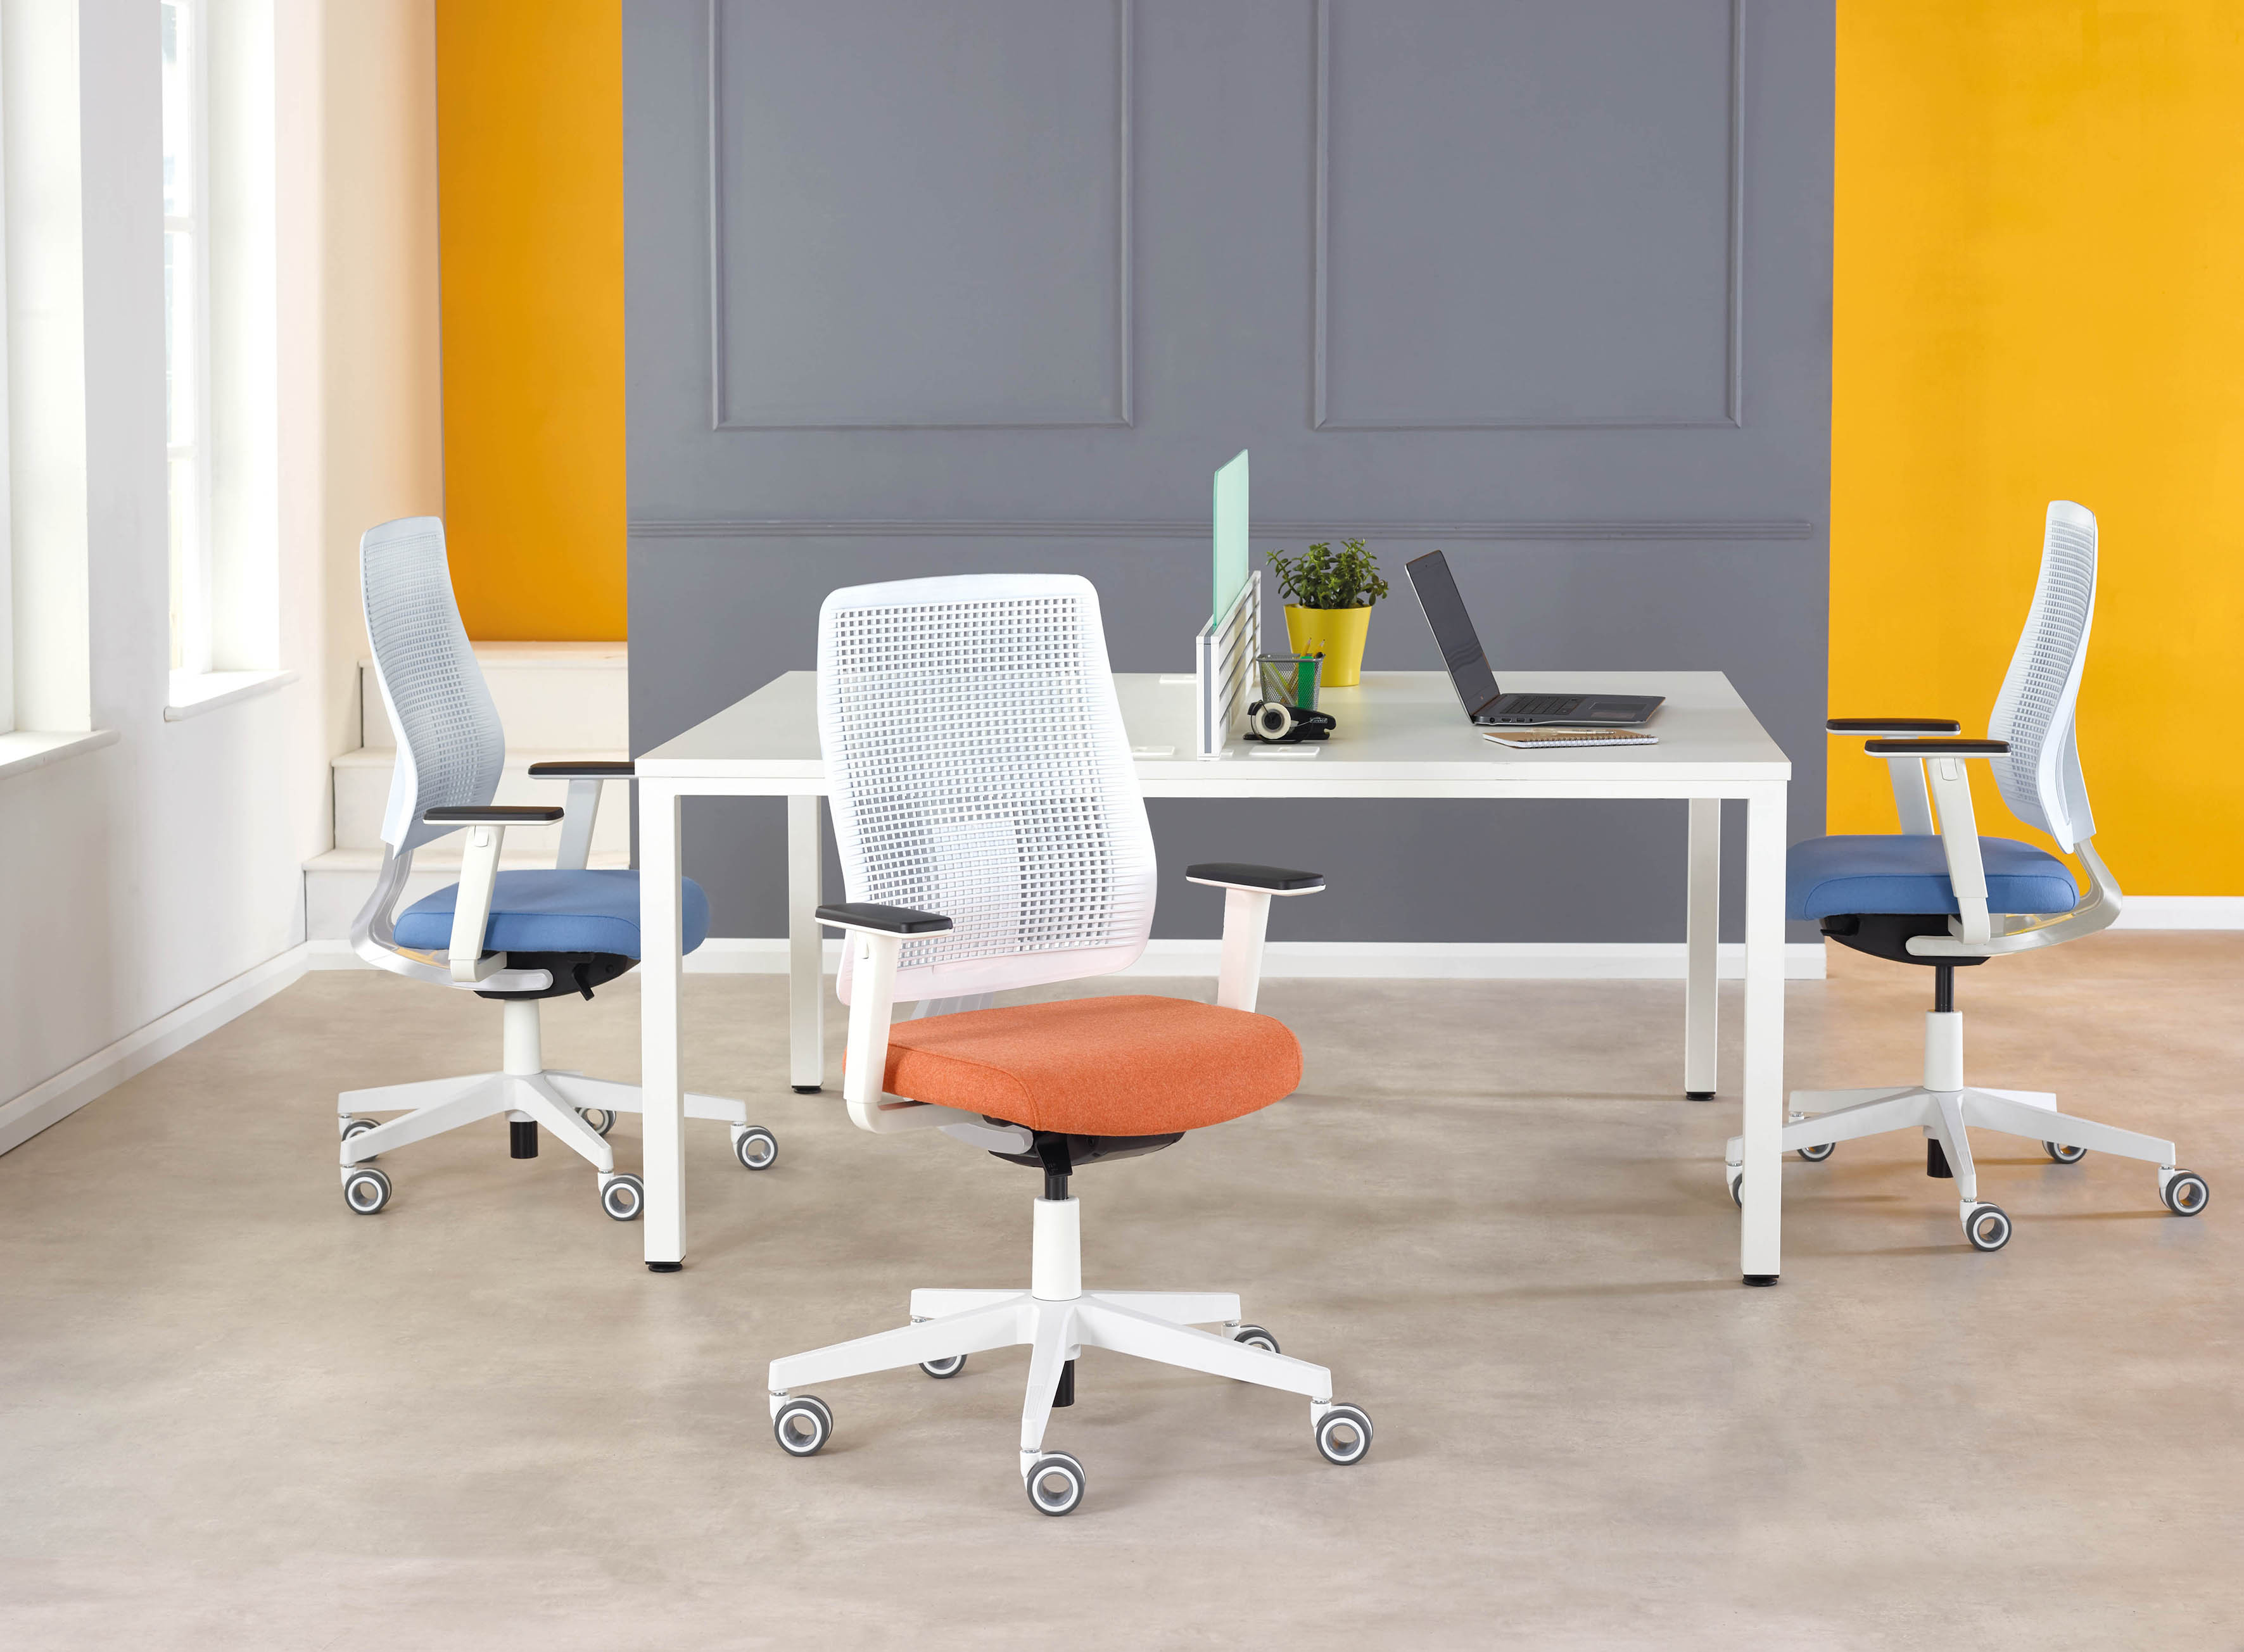 Ensemble white chairs